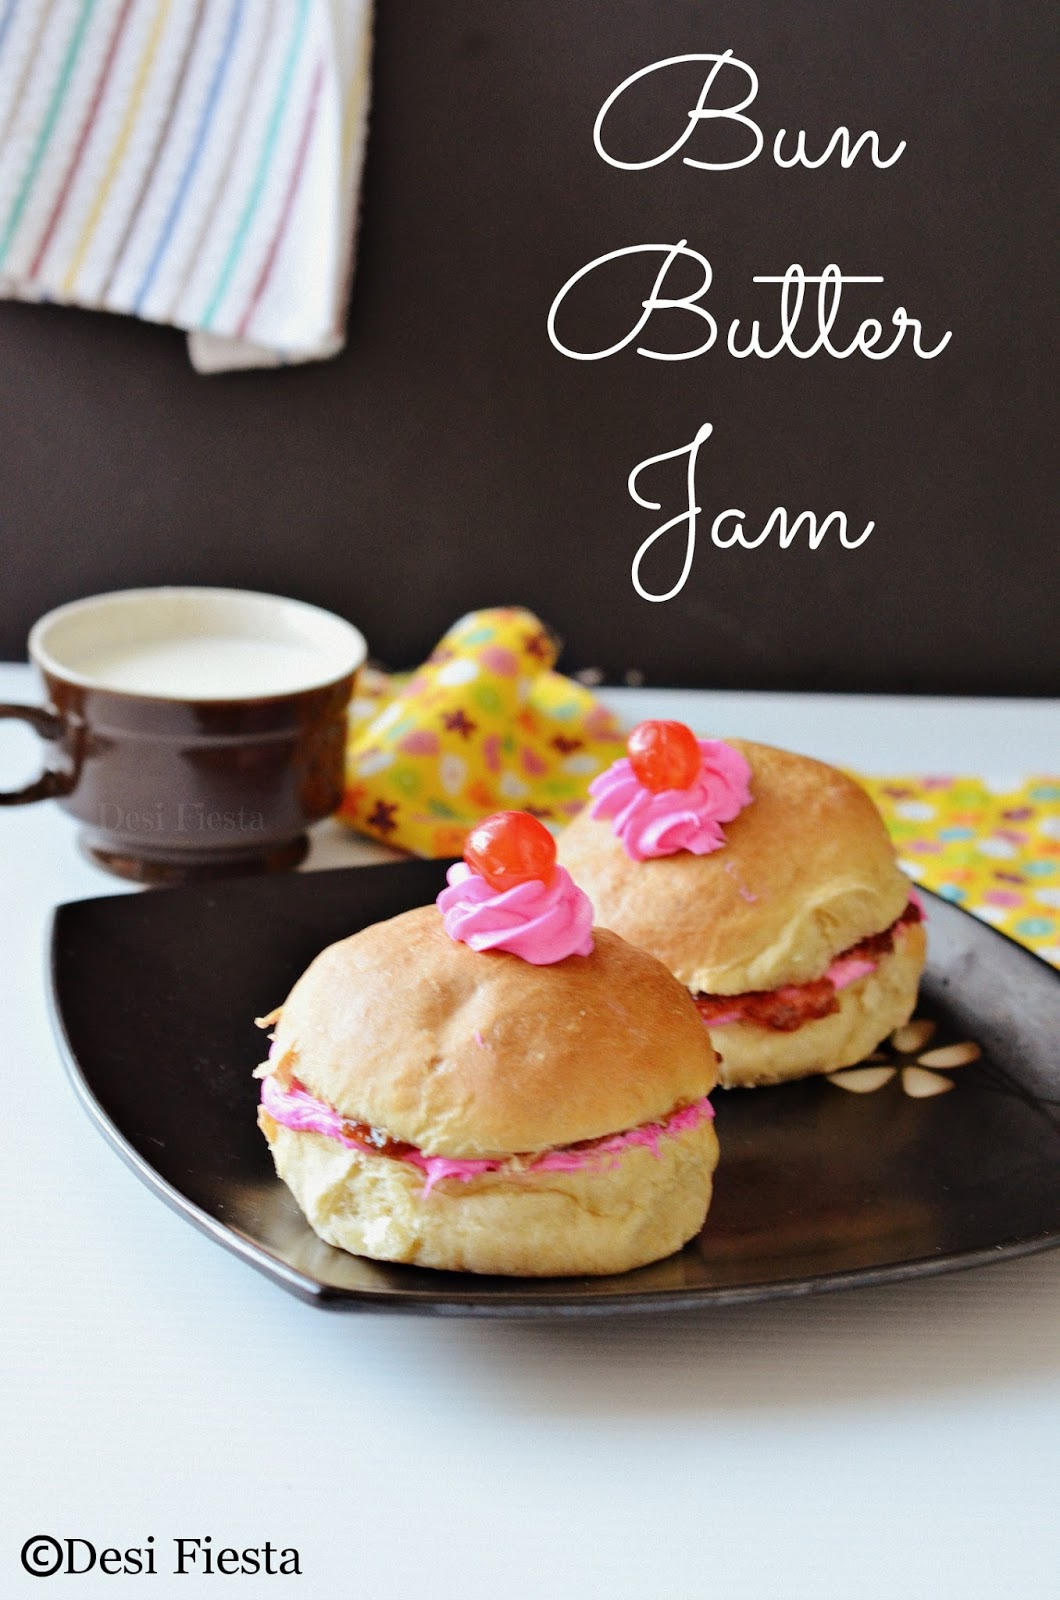 Indian bakery, Bun Butter jam